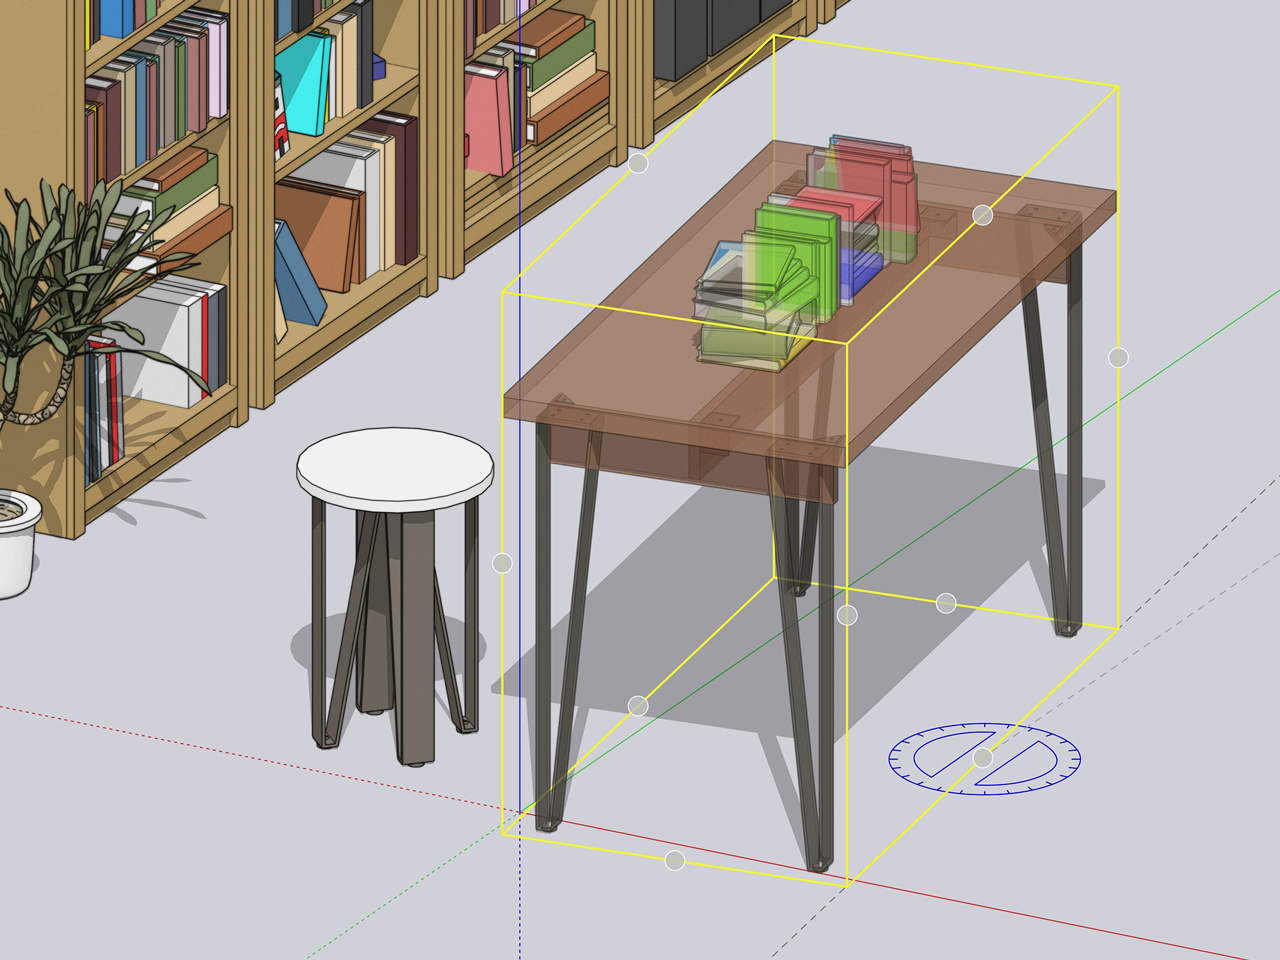 sketchup 2020.1 update grips